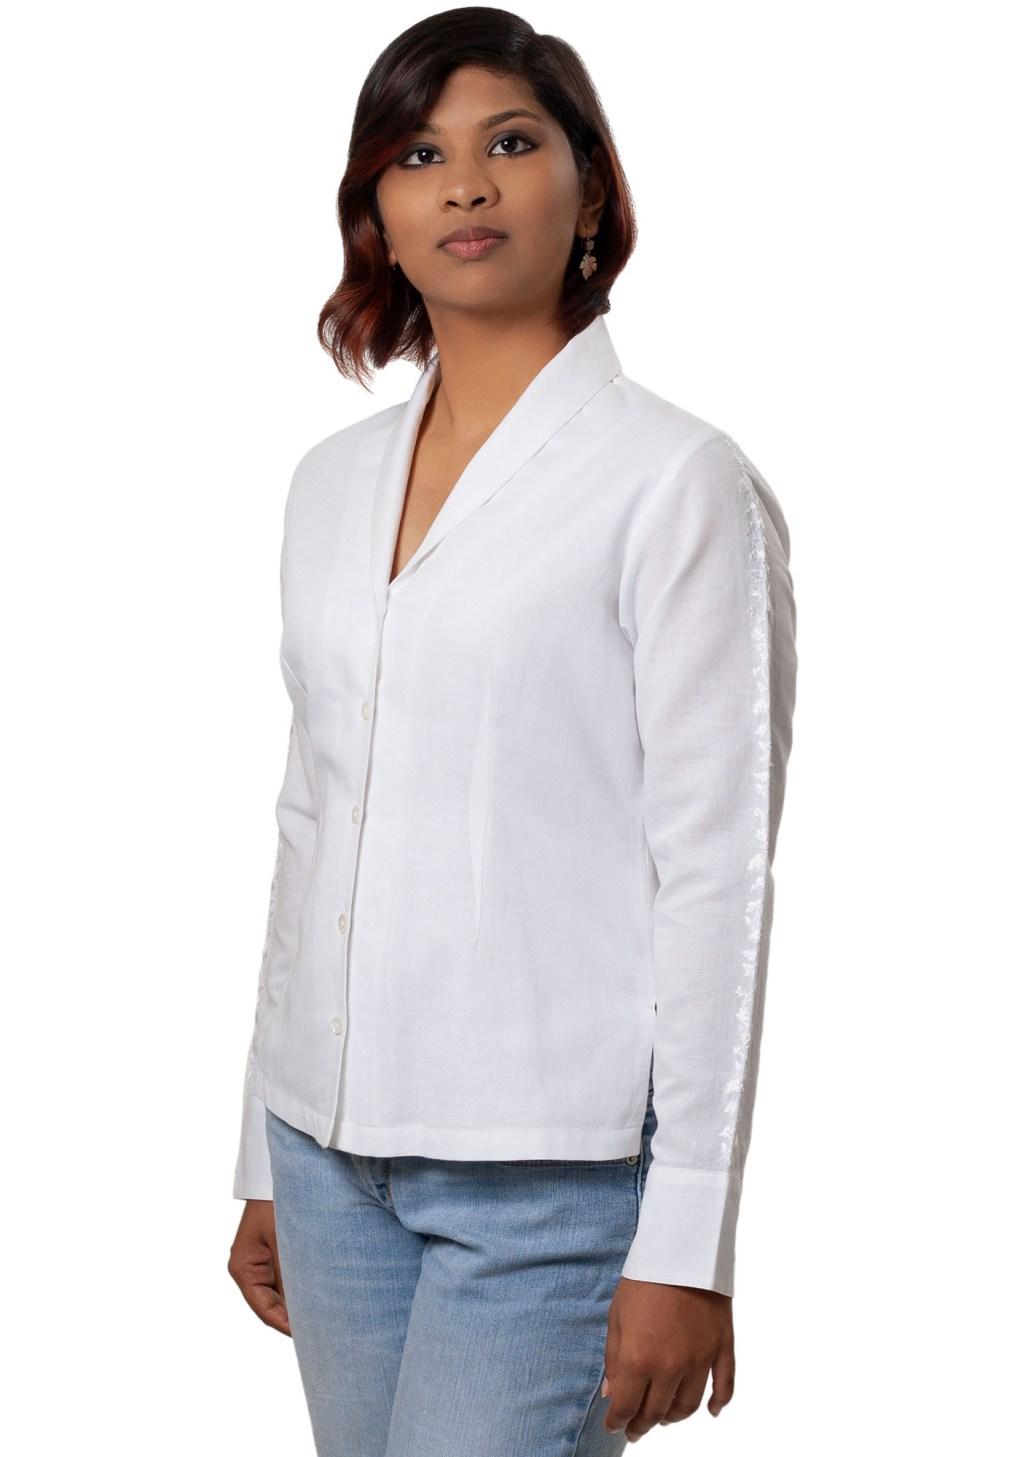 Formal Shawl Collar Shirt in White Linen